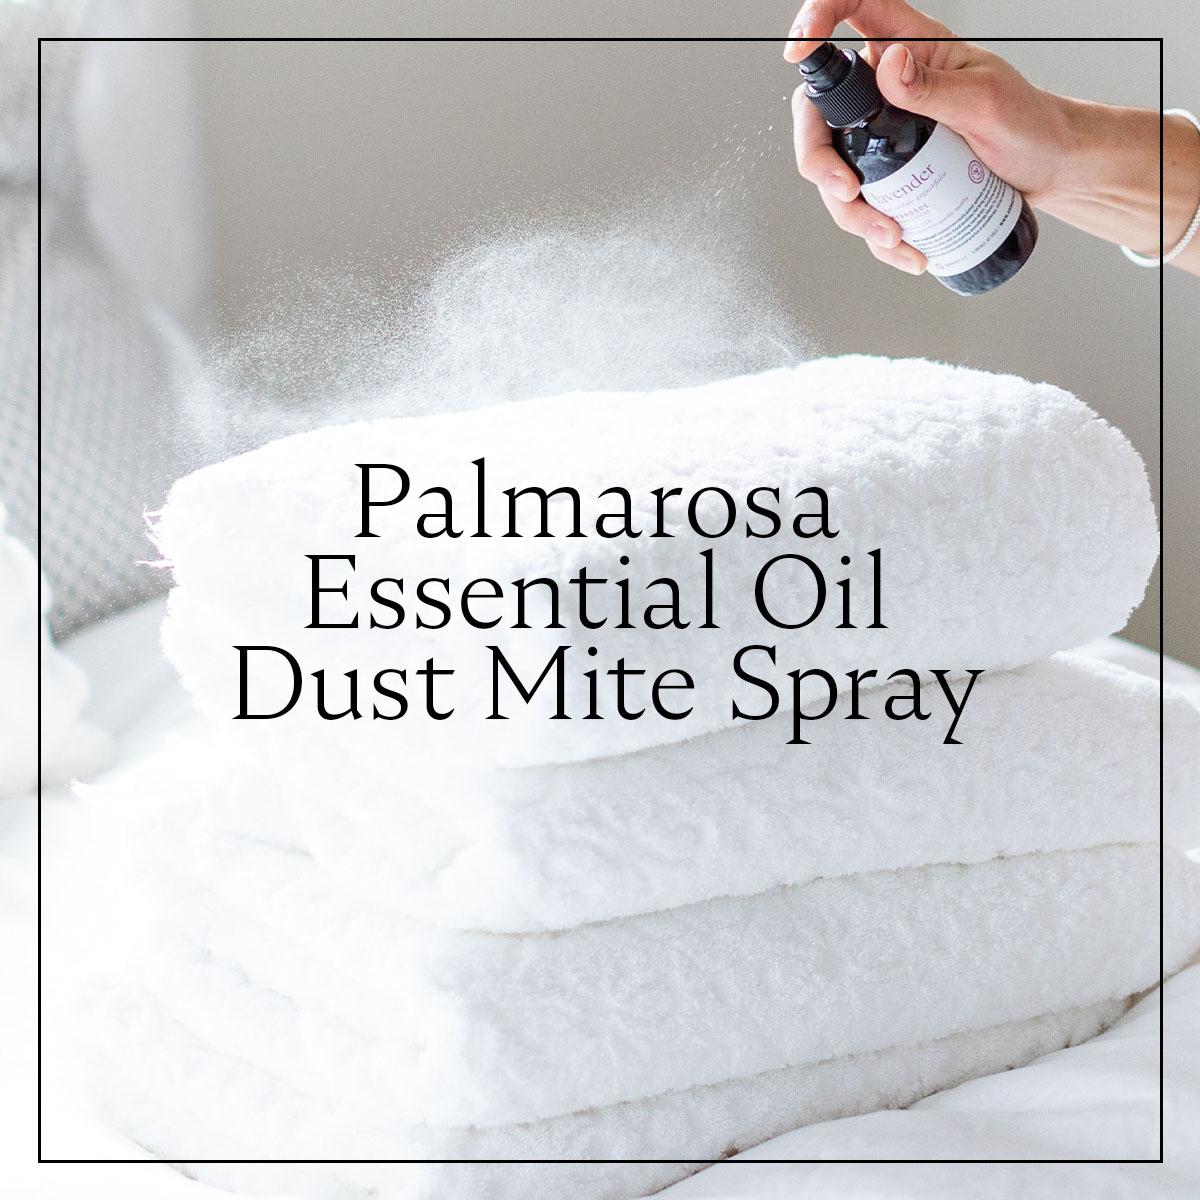 An Essential Oil Dust Mite Spray Recipe